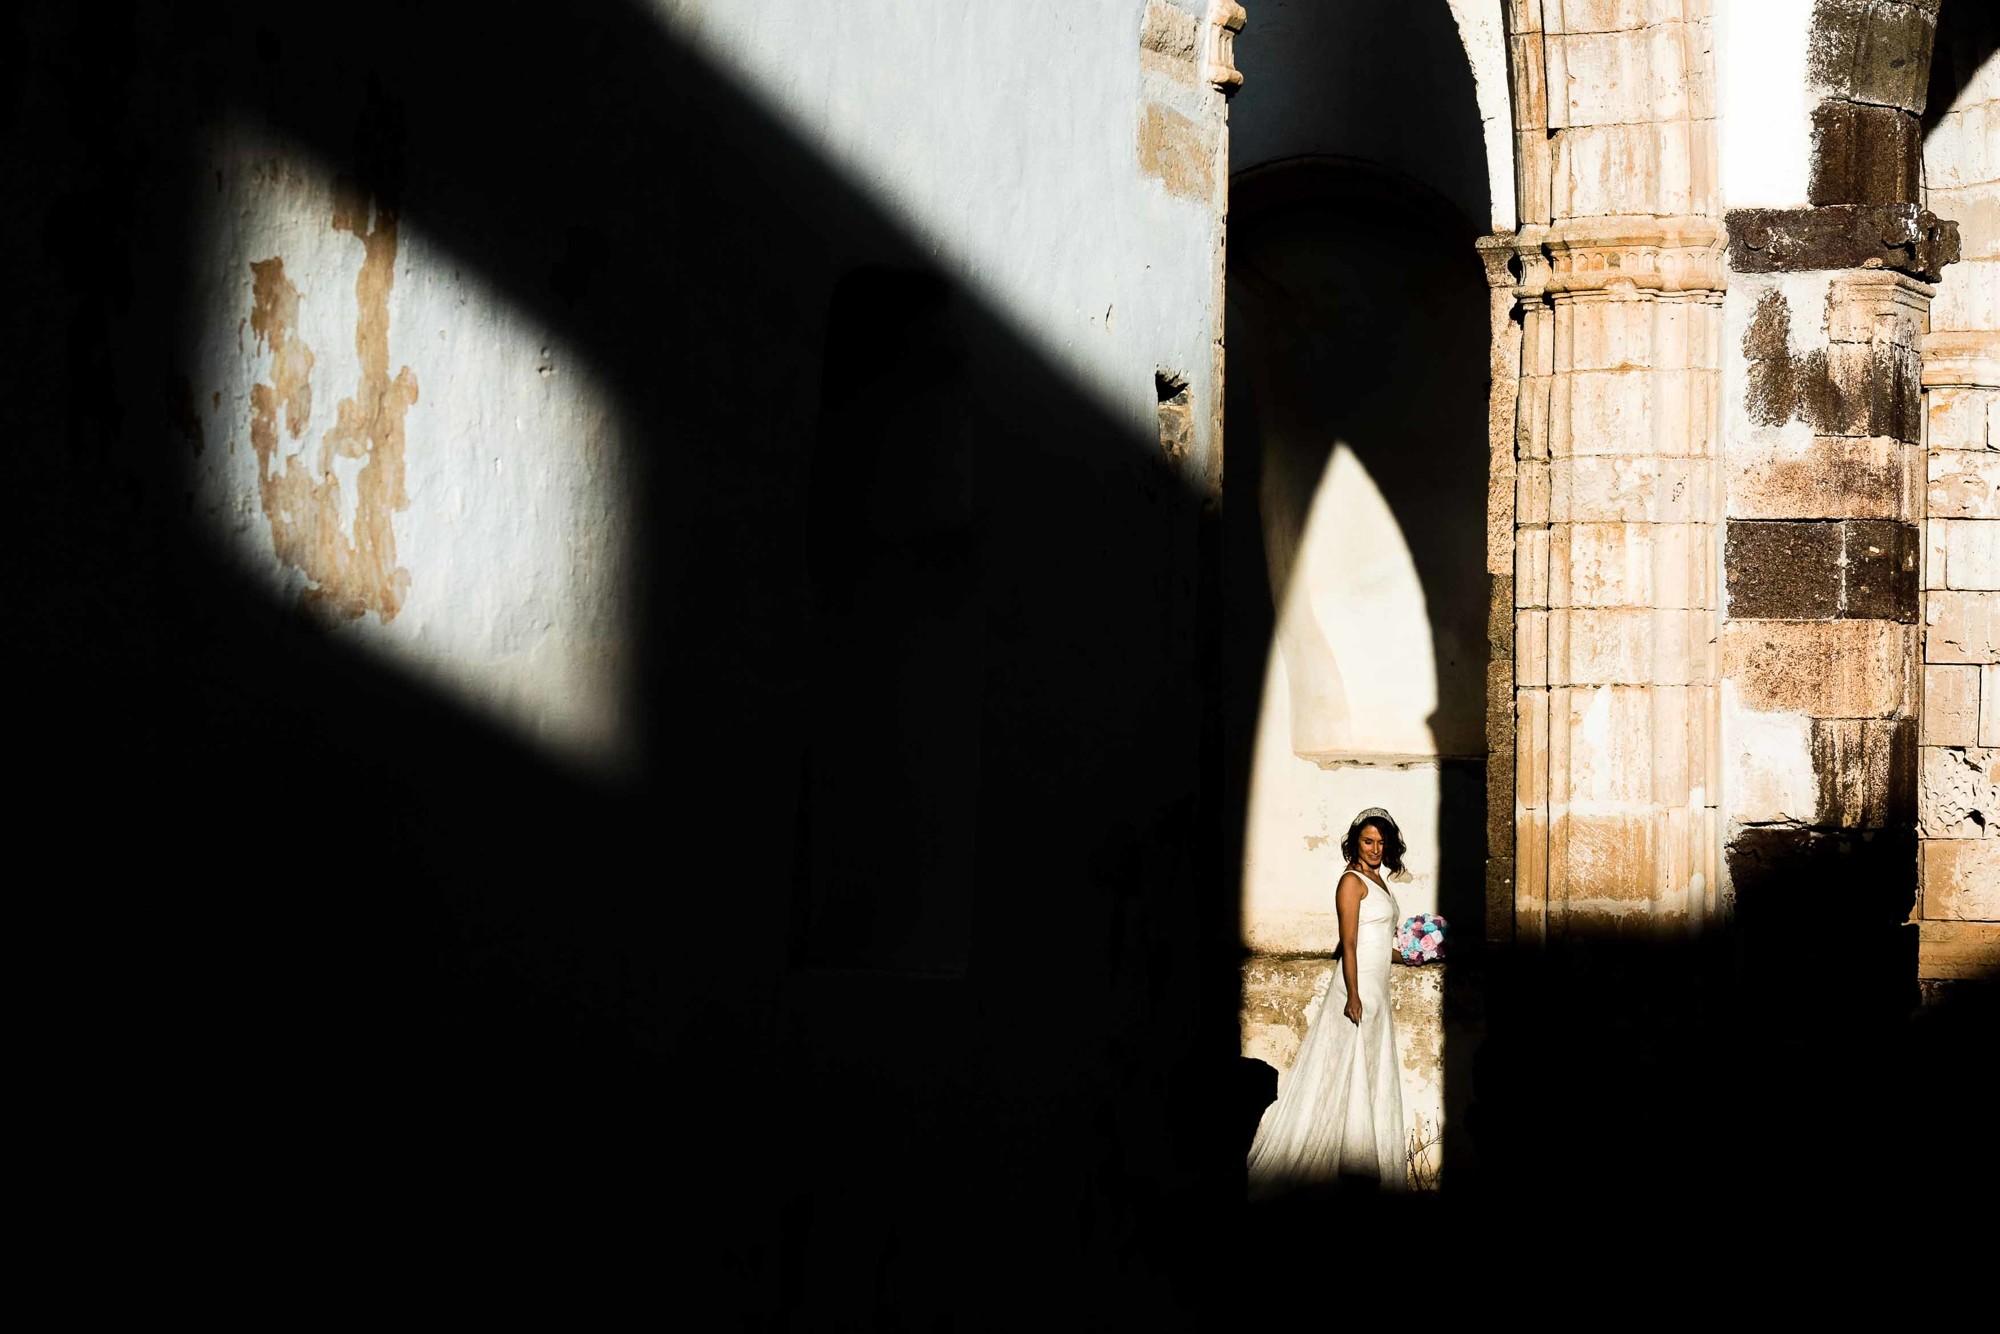 fotografo fuerteventura fotos de boda  1